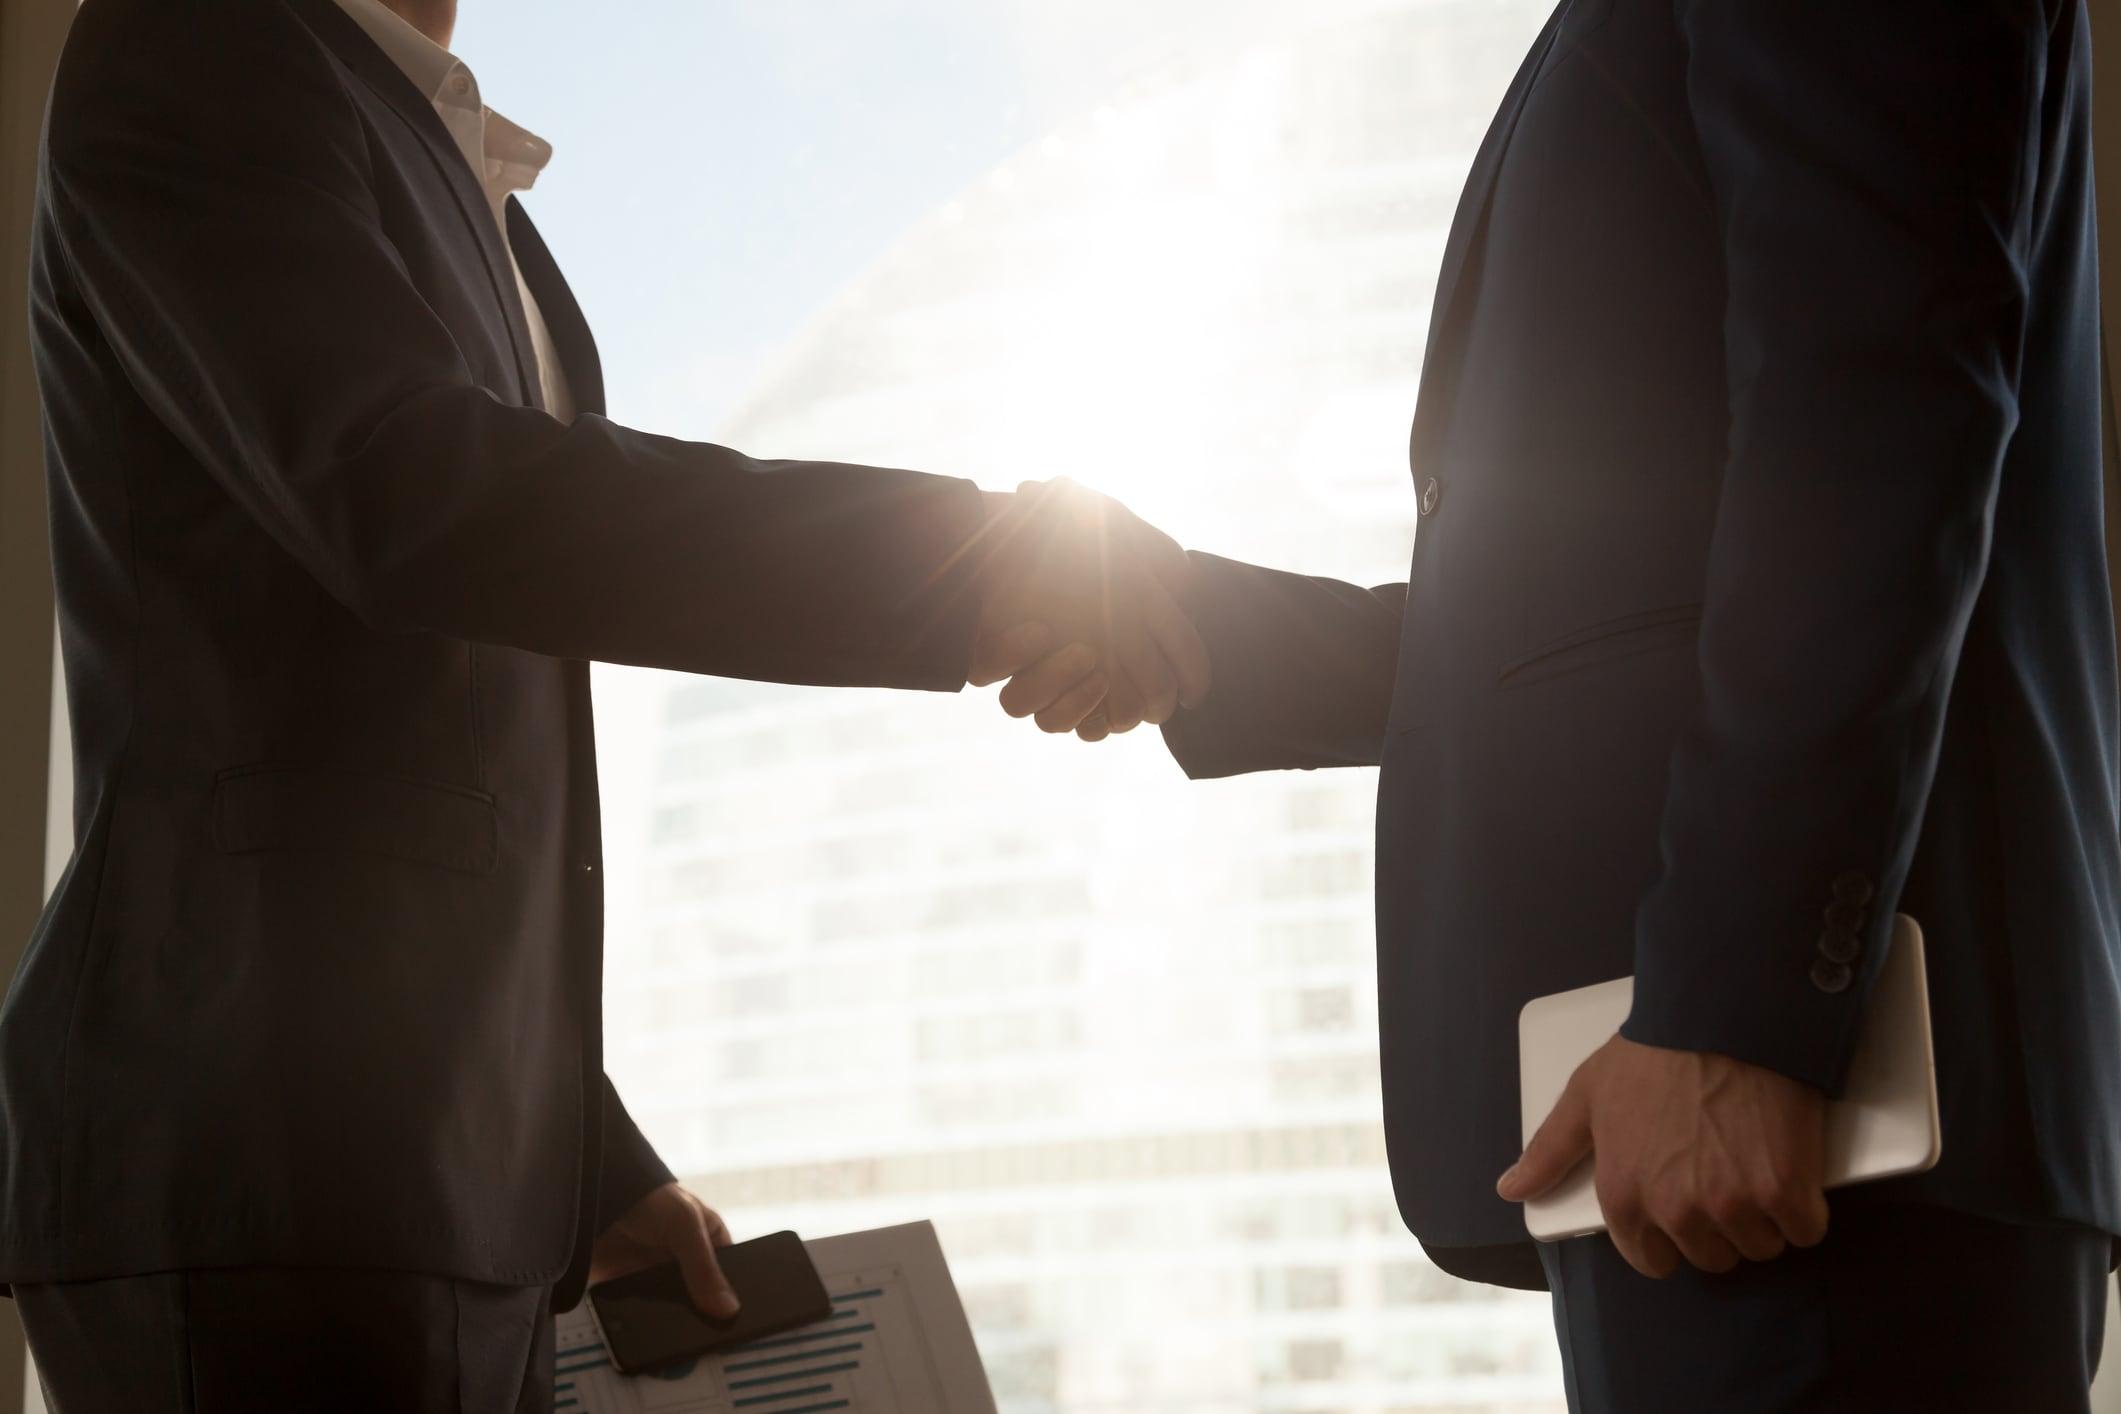 Business handshake, two businessmen shaking hands, partnership concept, close up